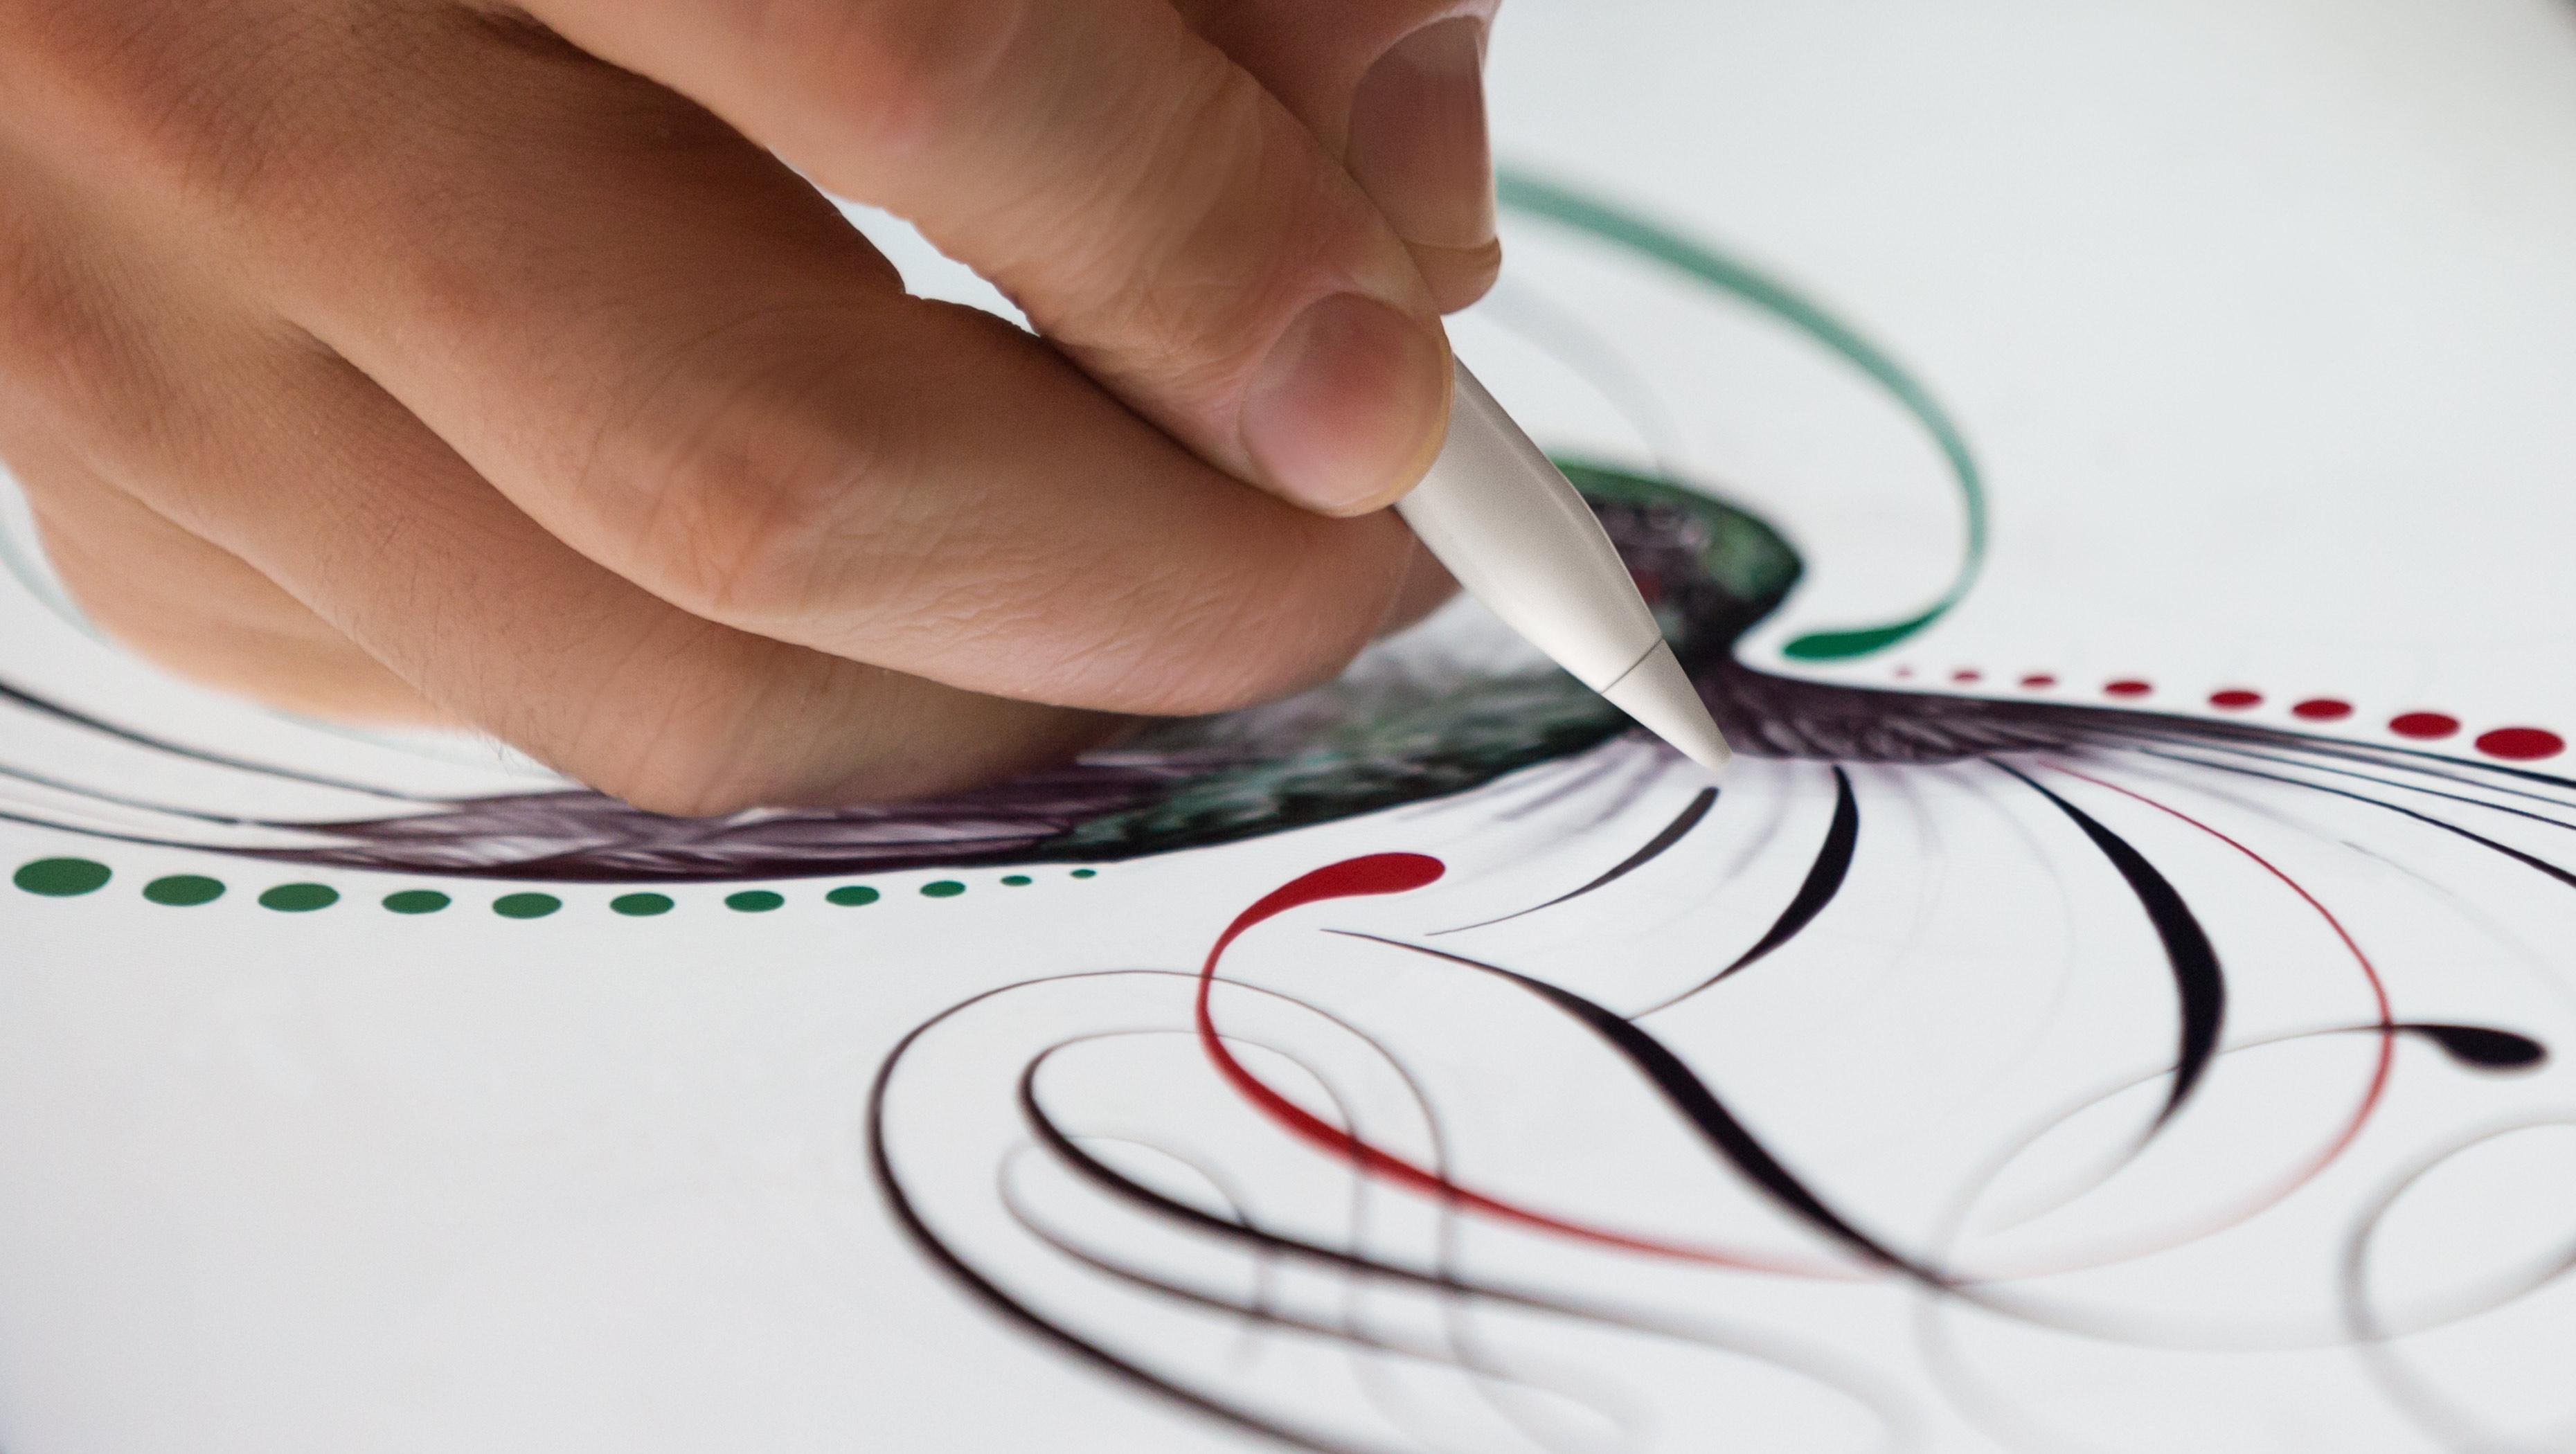 Apple Pencil image 002